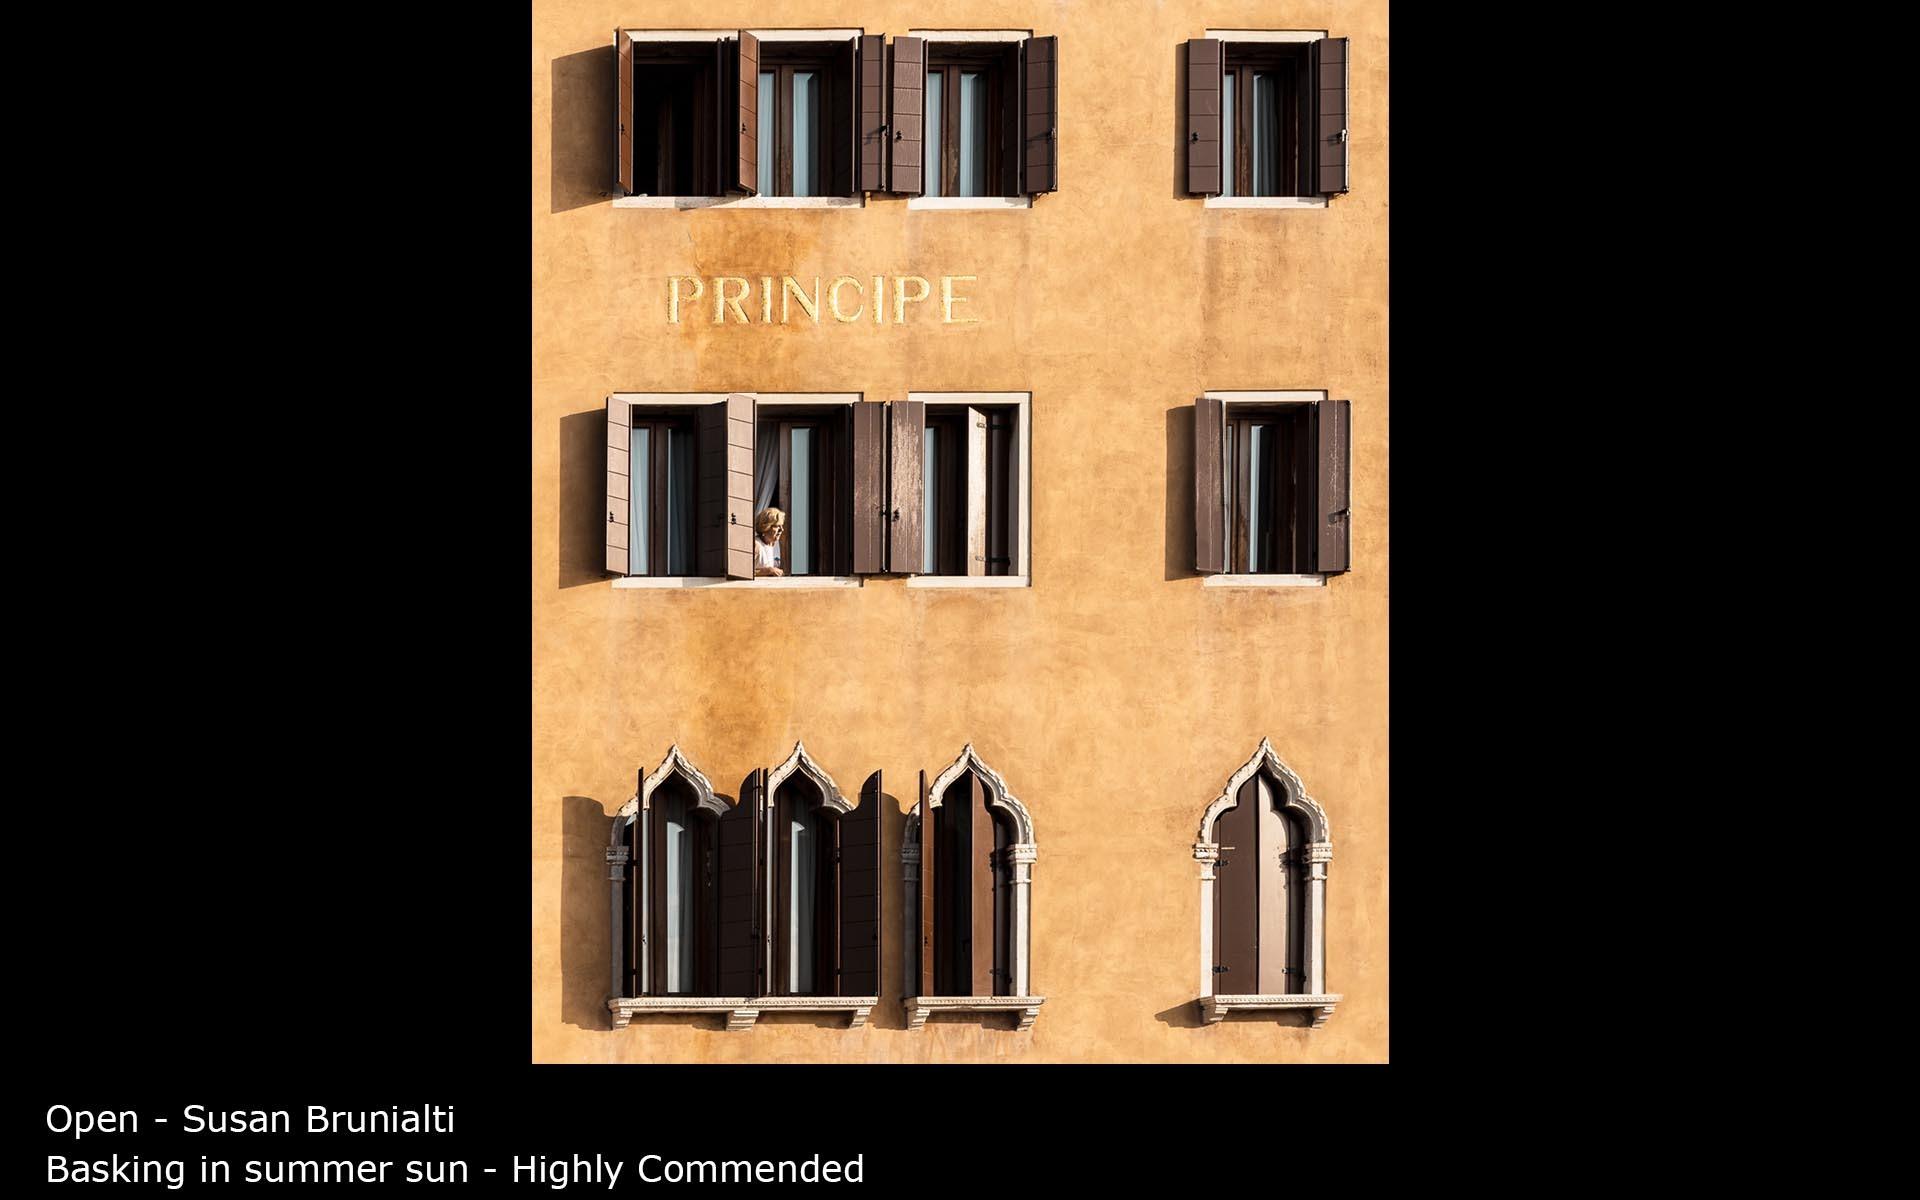 Basking in summer sun - Susan Brunialti